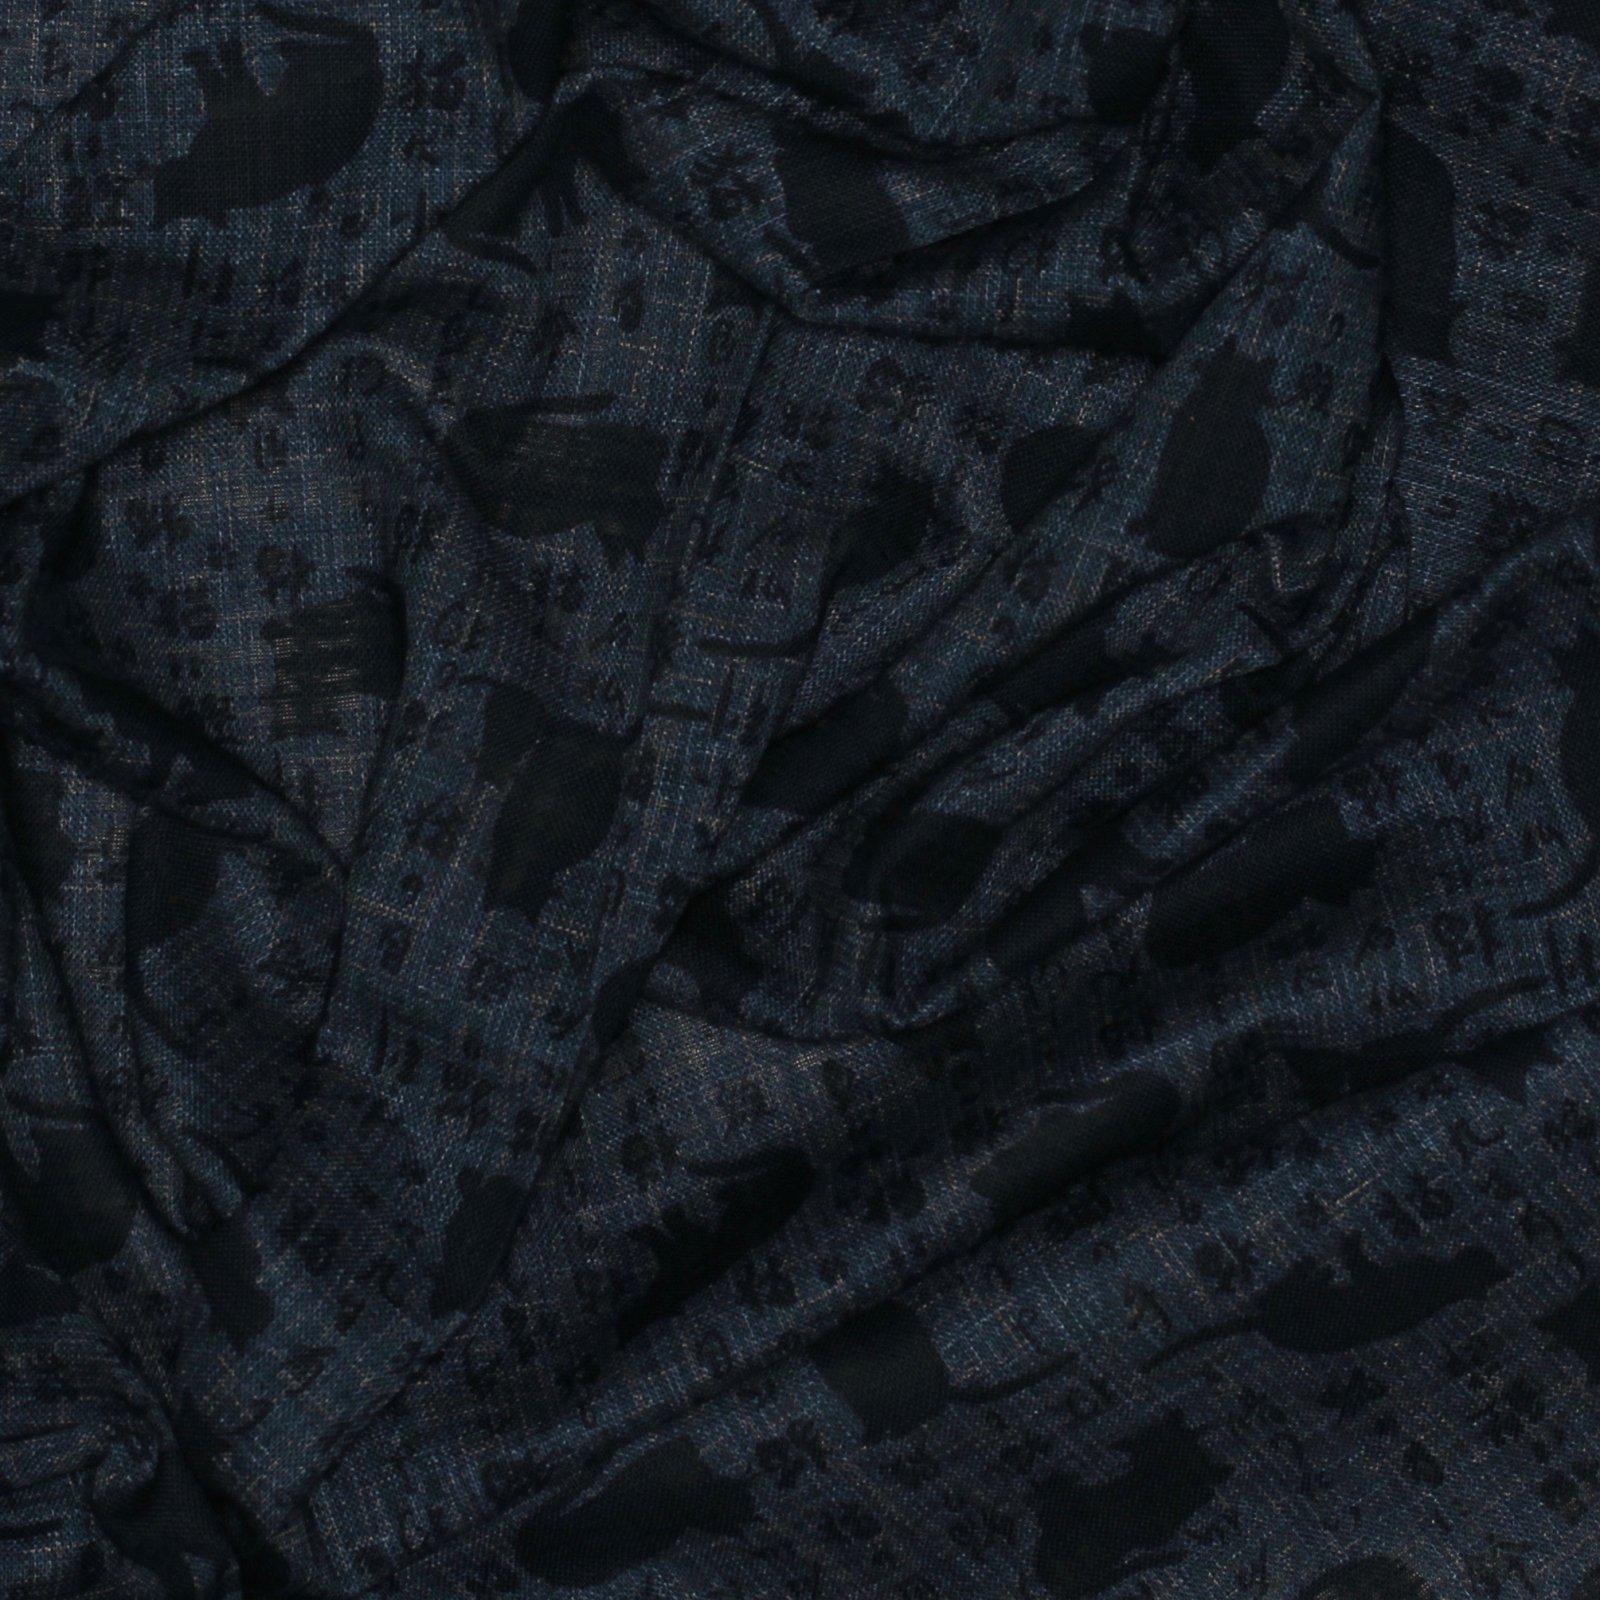 Cat Silhouette on Blue; Japanese Cotton; 100% COTTON - 45